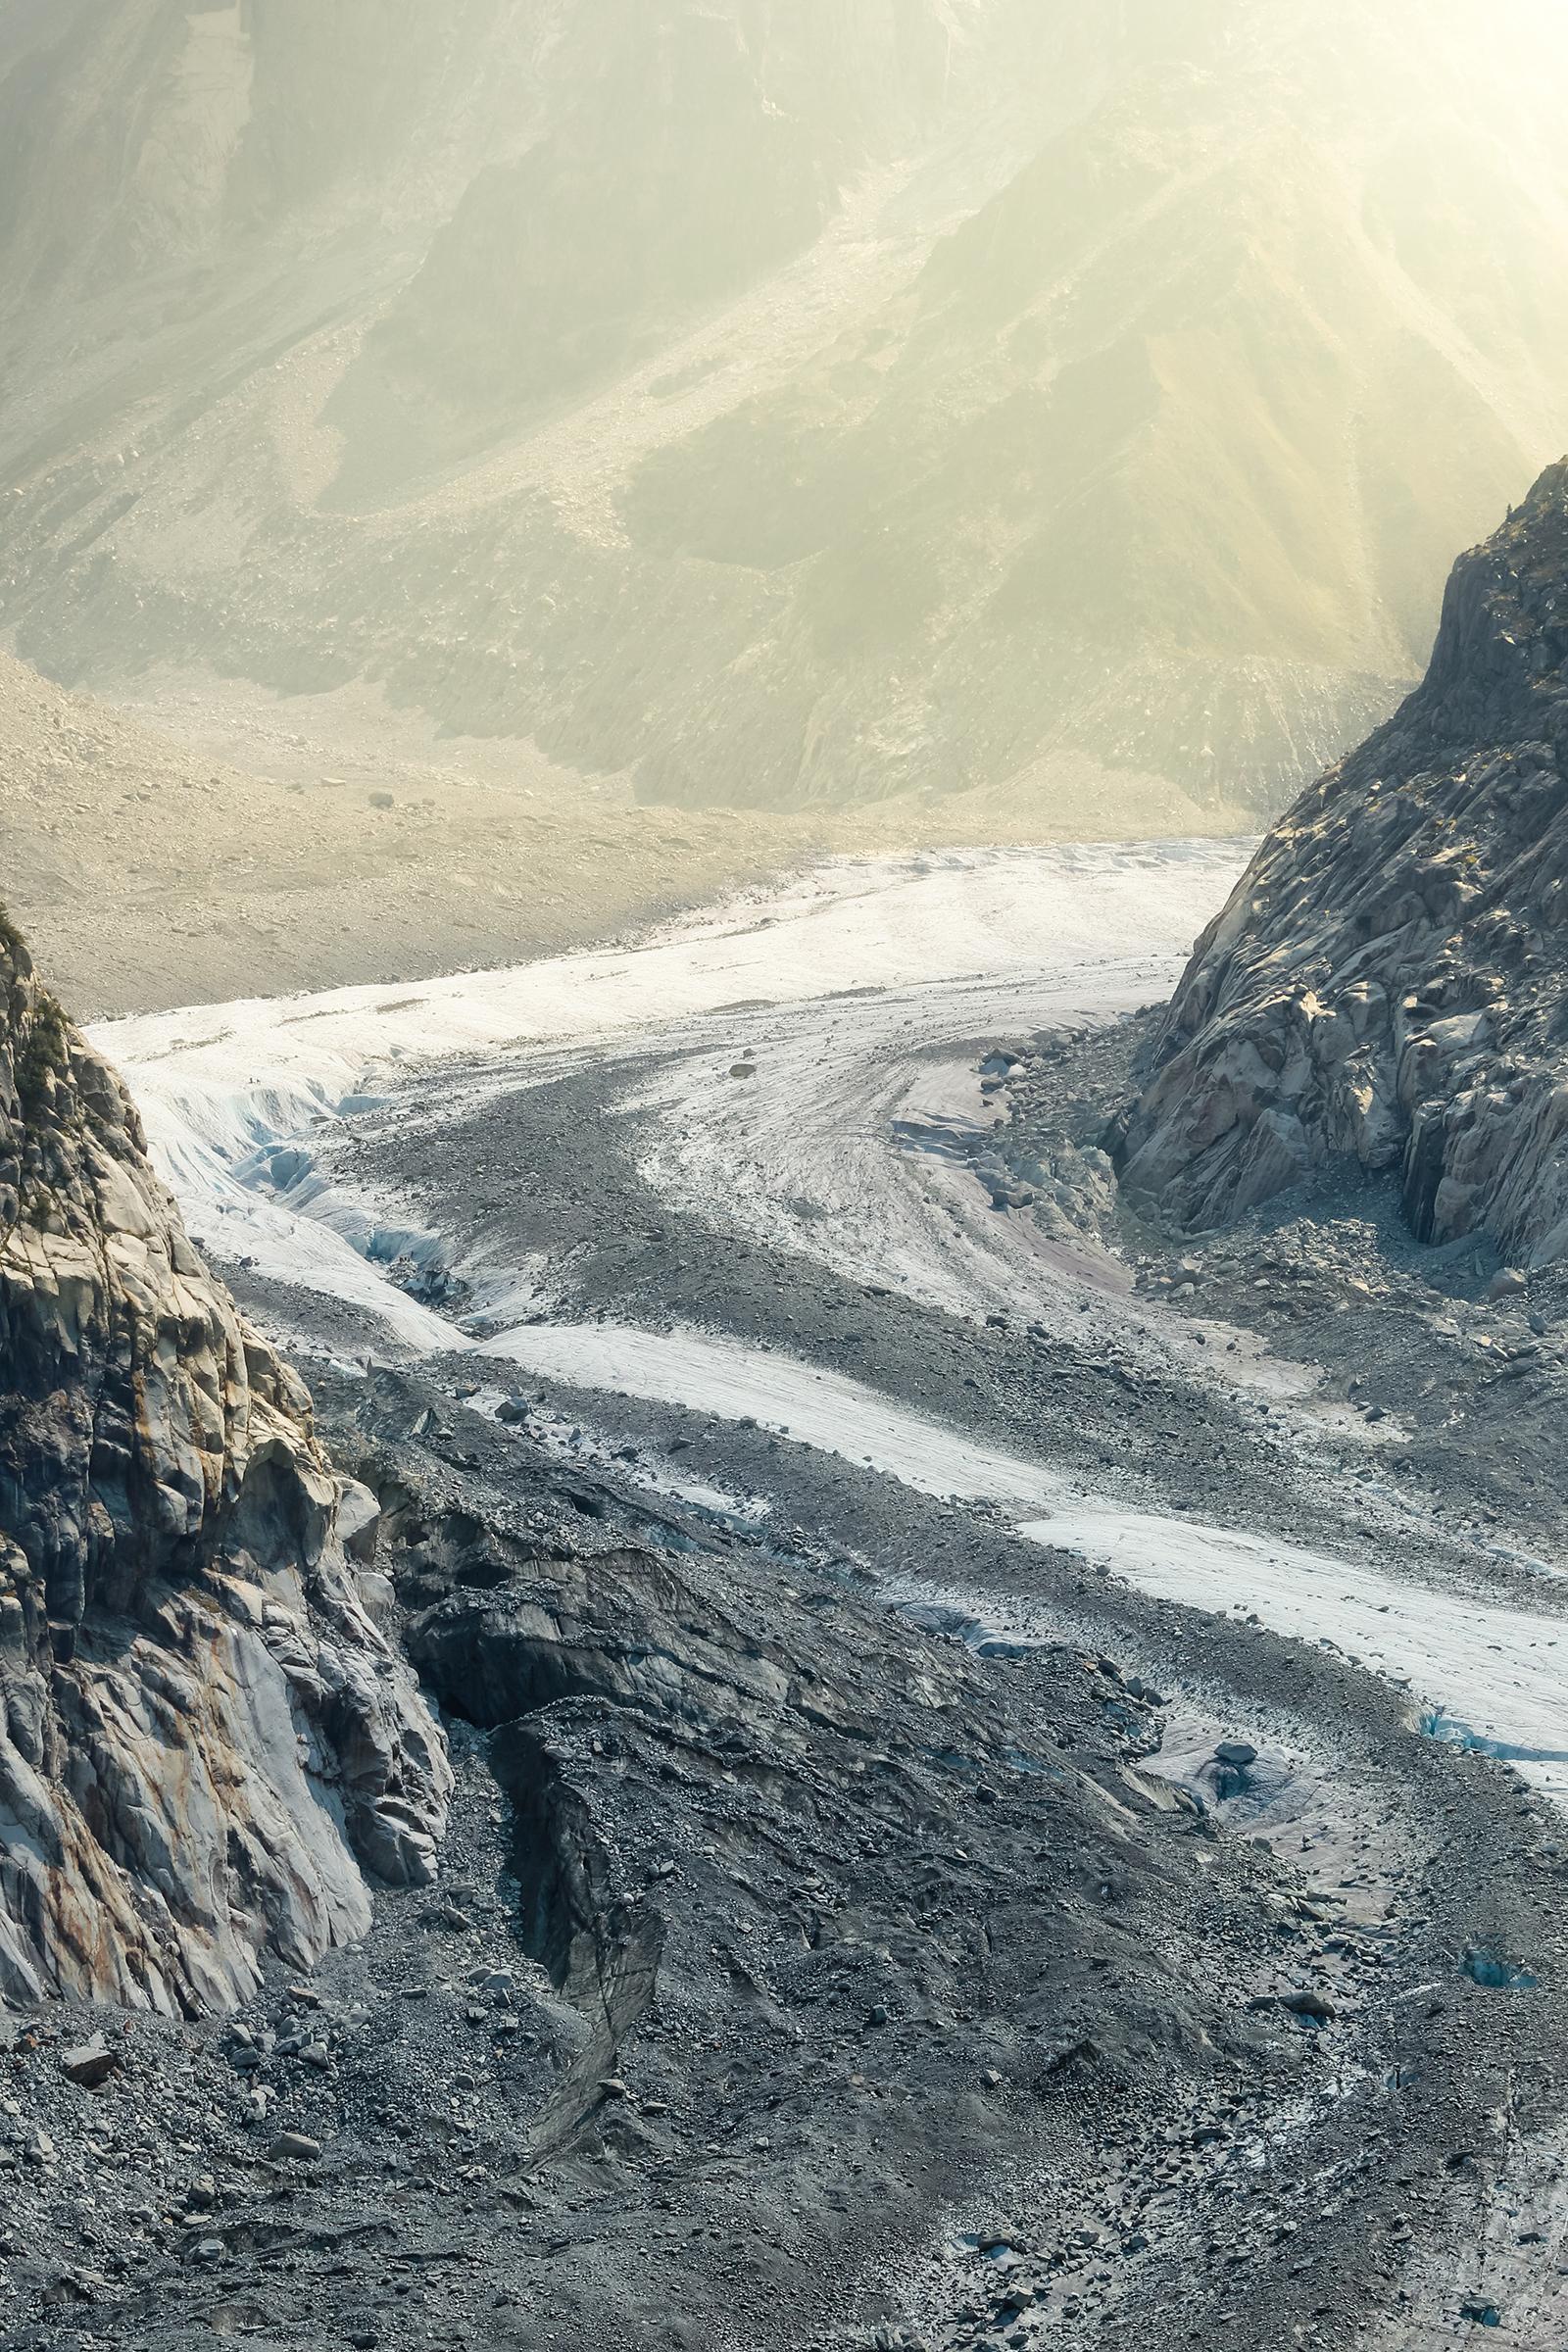 S Curve Road Image